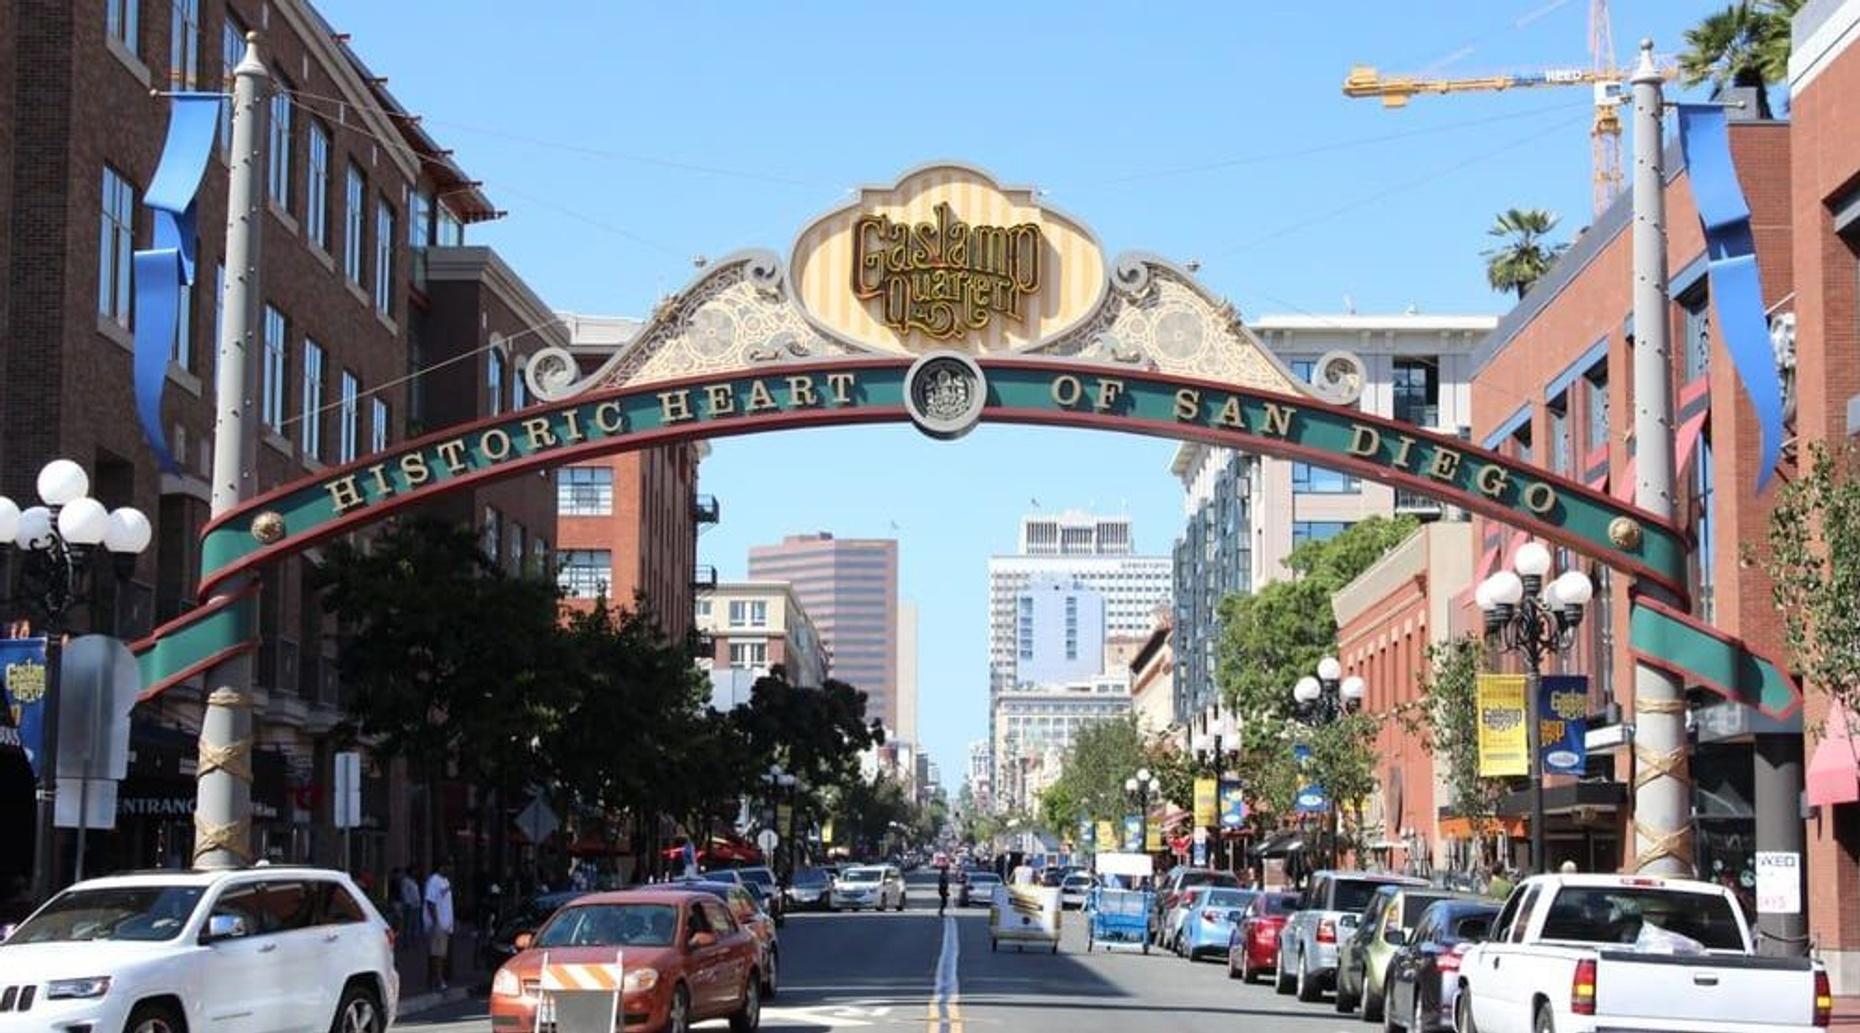 San Diego, La Jolla, and Coronado Tour